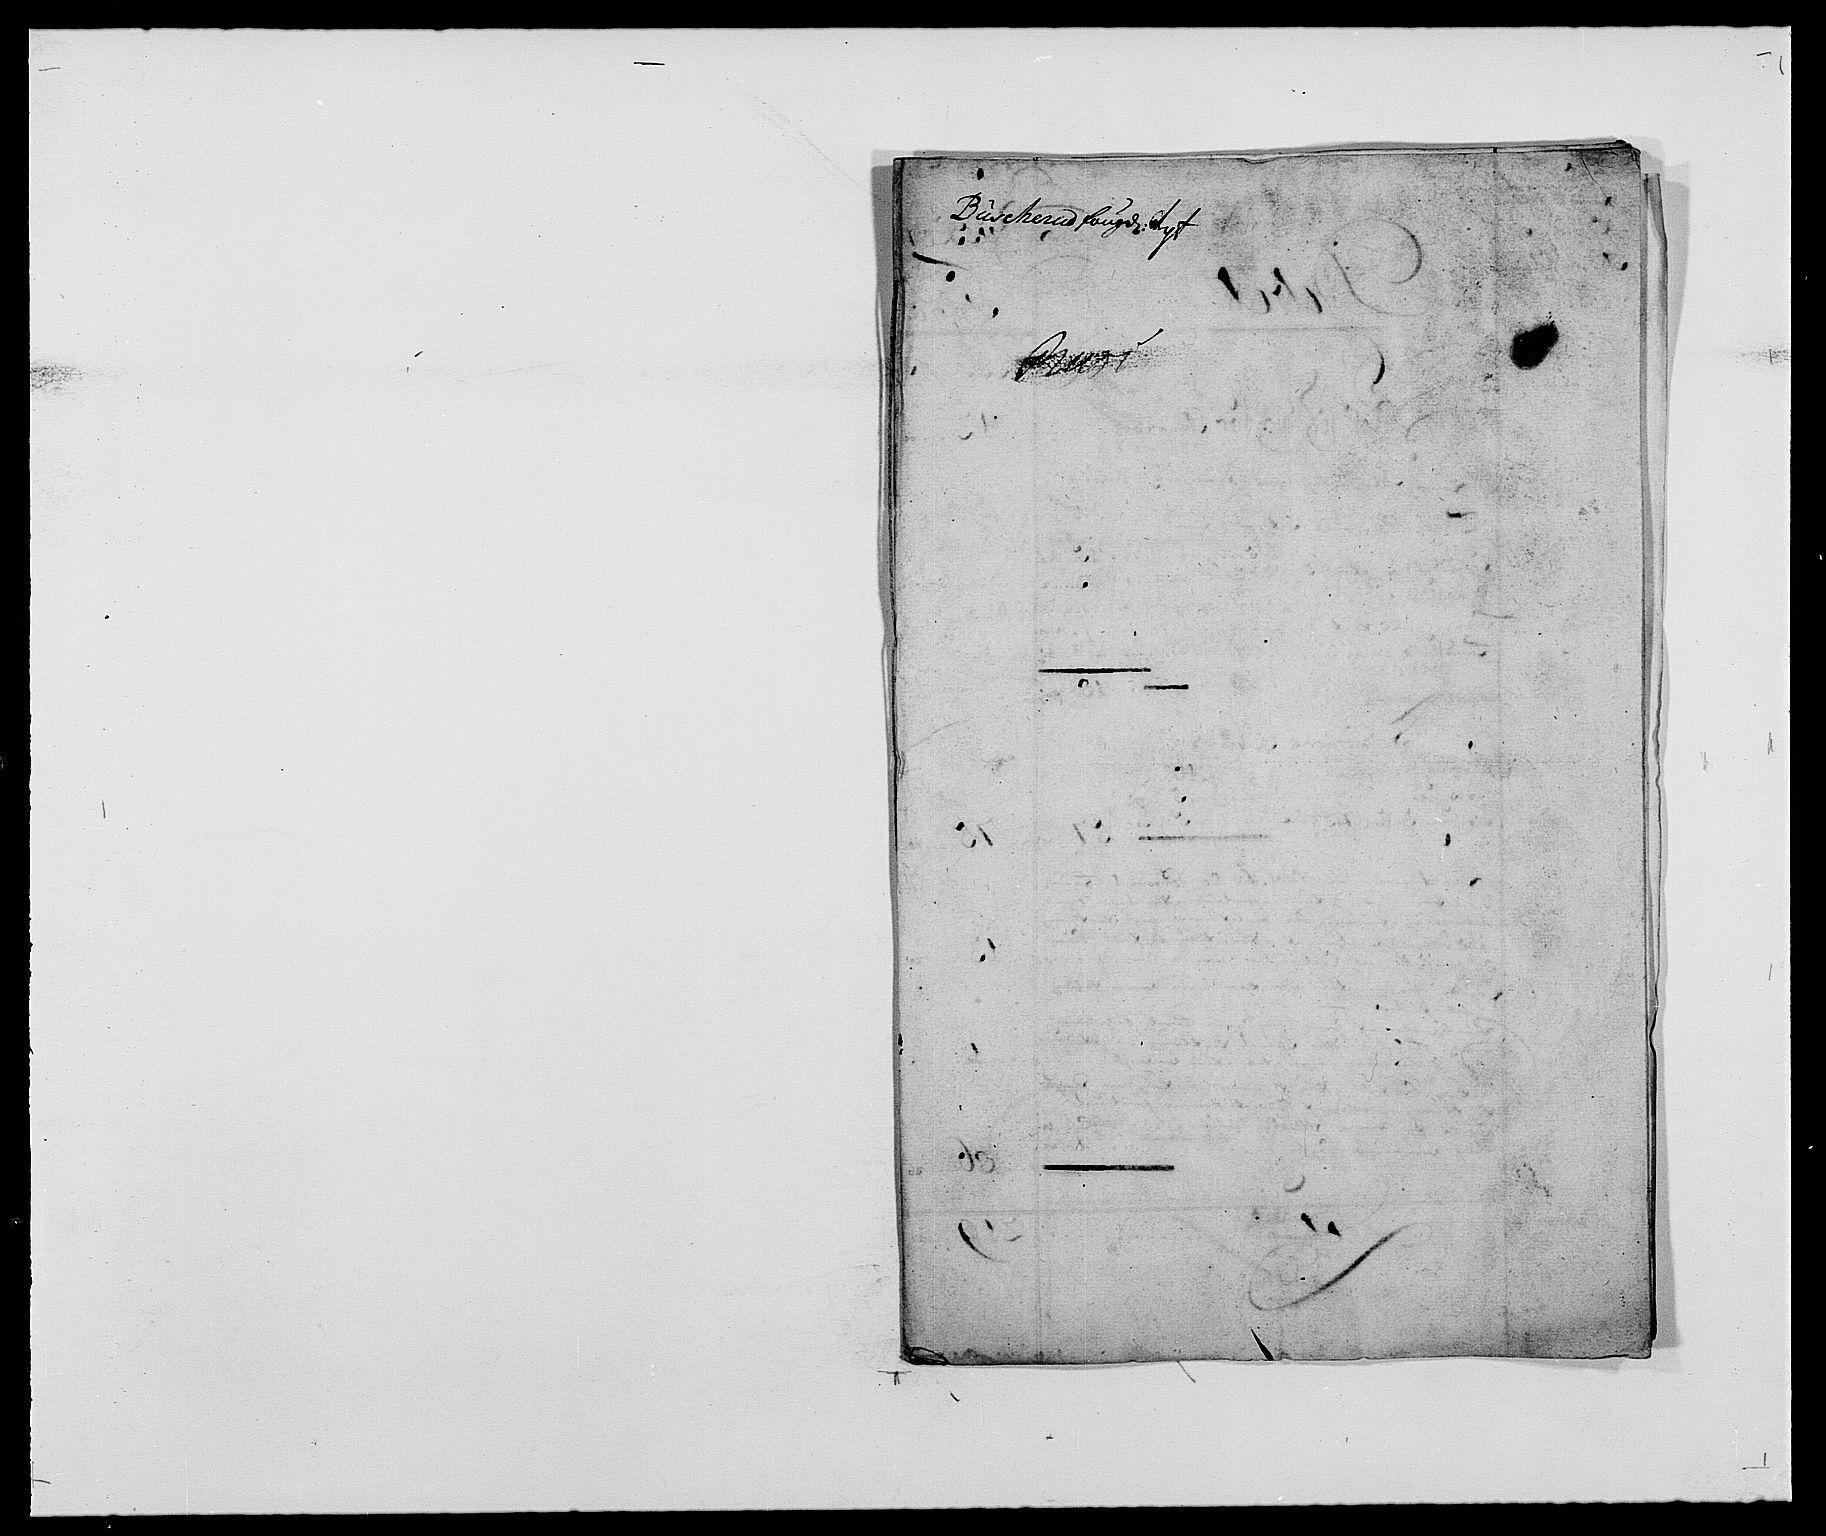 RA, Rentekammeret inntil 1814, Reviderte regnskaper, Fogderegnskap, R25/L1680: Fogderegnskap Buskerud, 1689-1690, s. 12